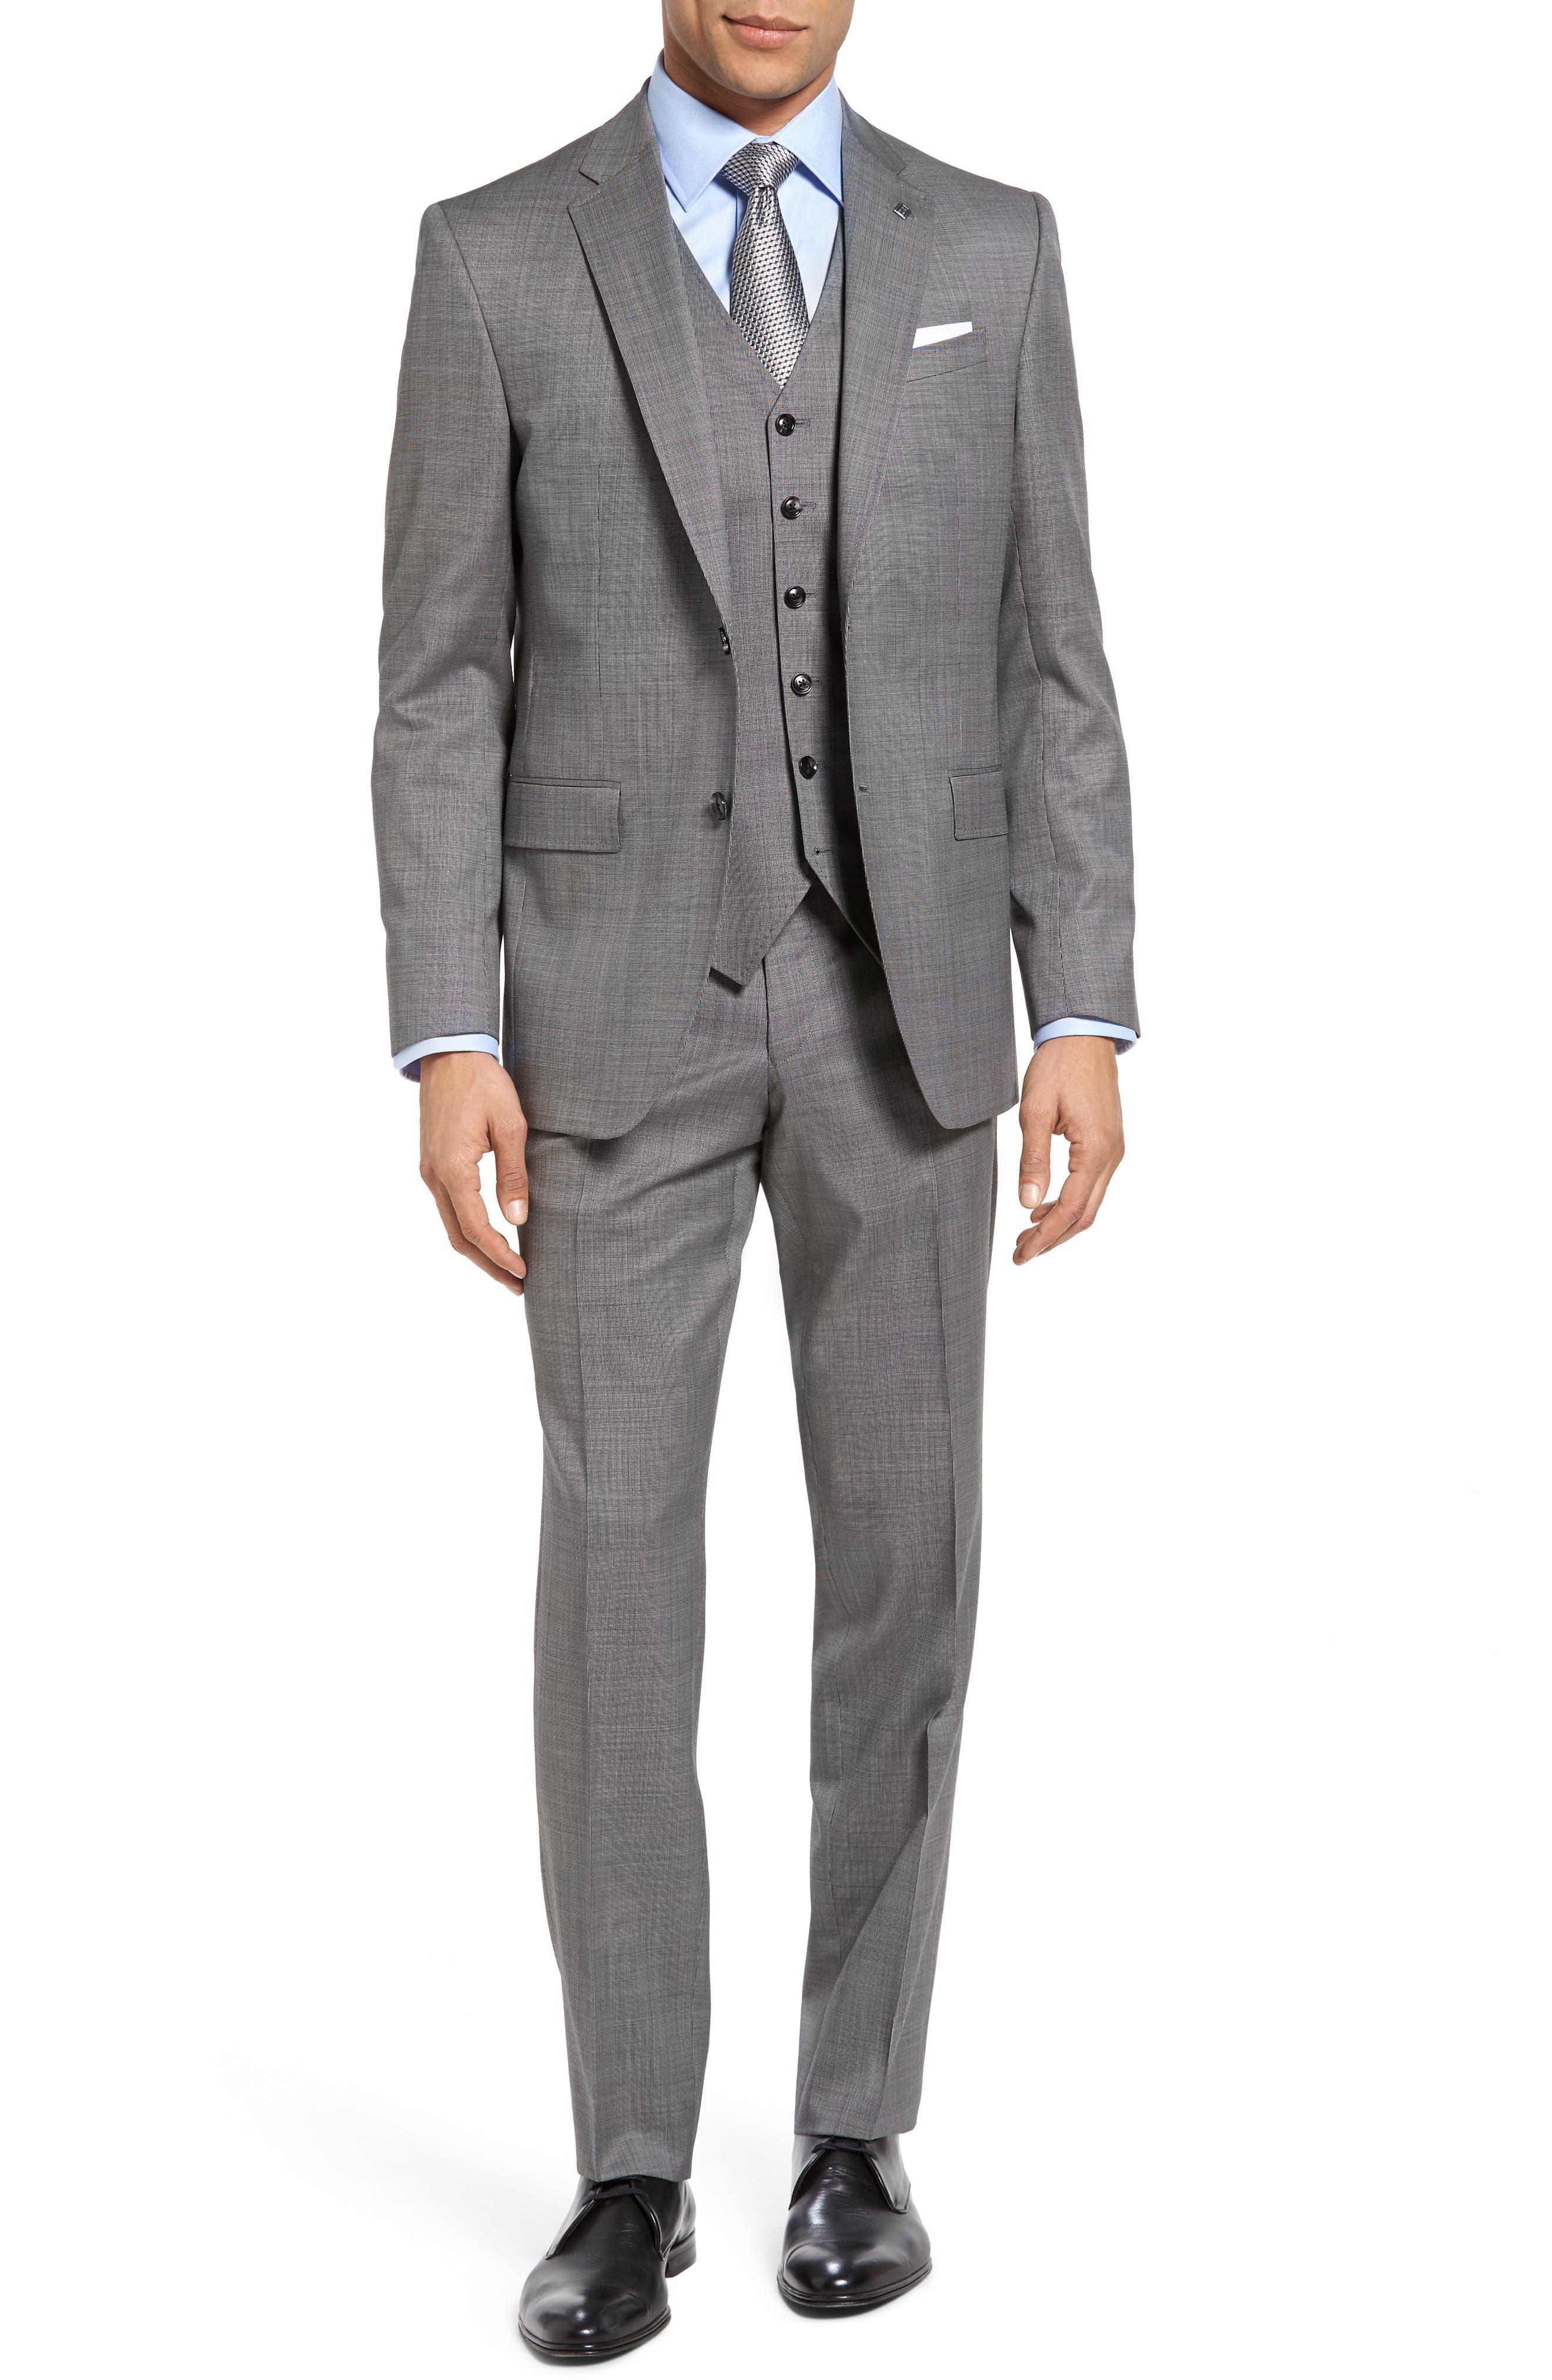 Jay Trim Fit Solid Wool Suit,                             Alternate thumbnail 2, color,                             LIGHT GREY